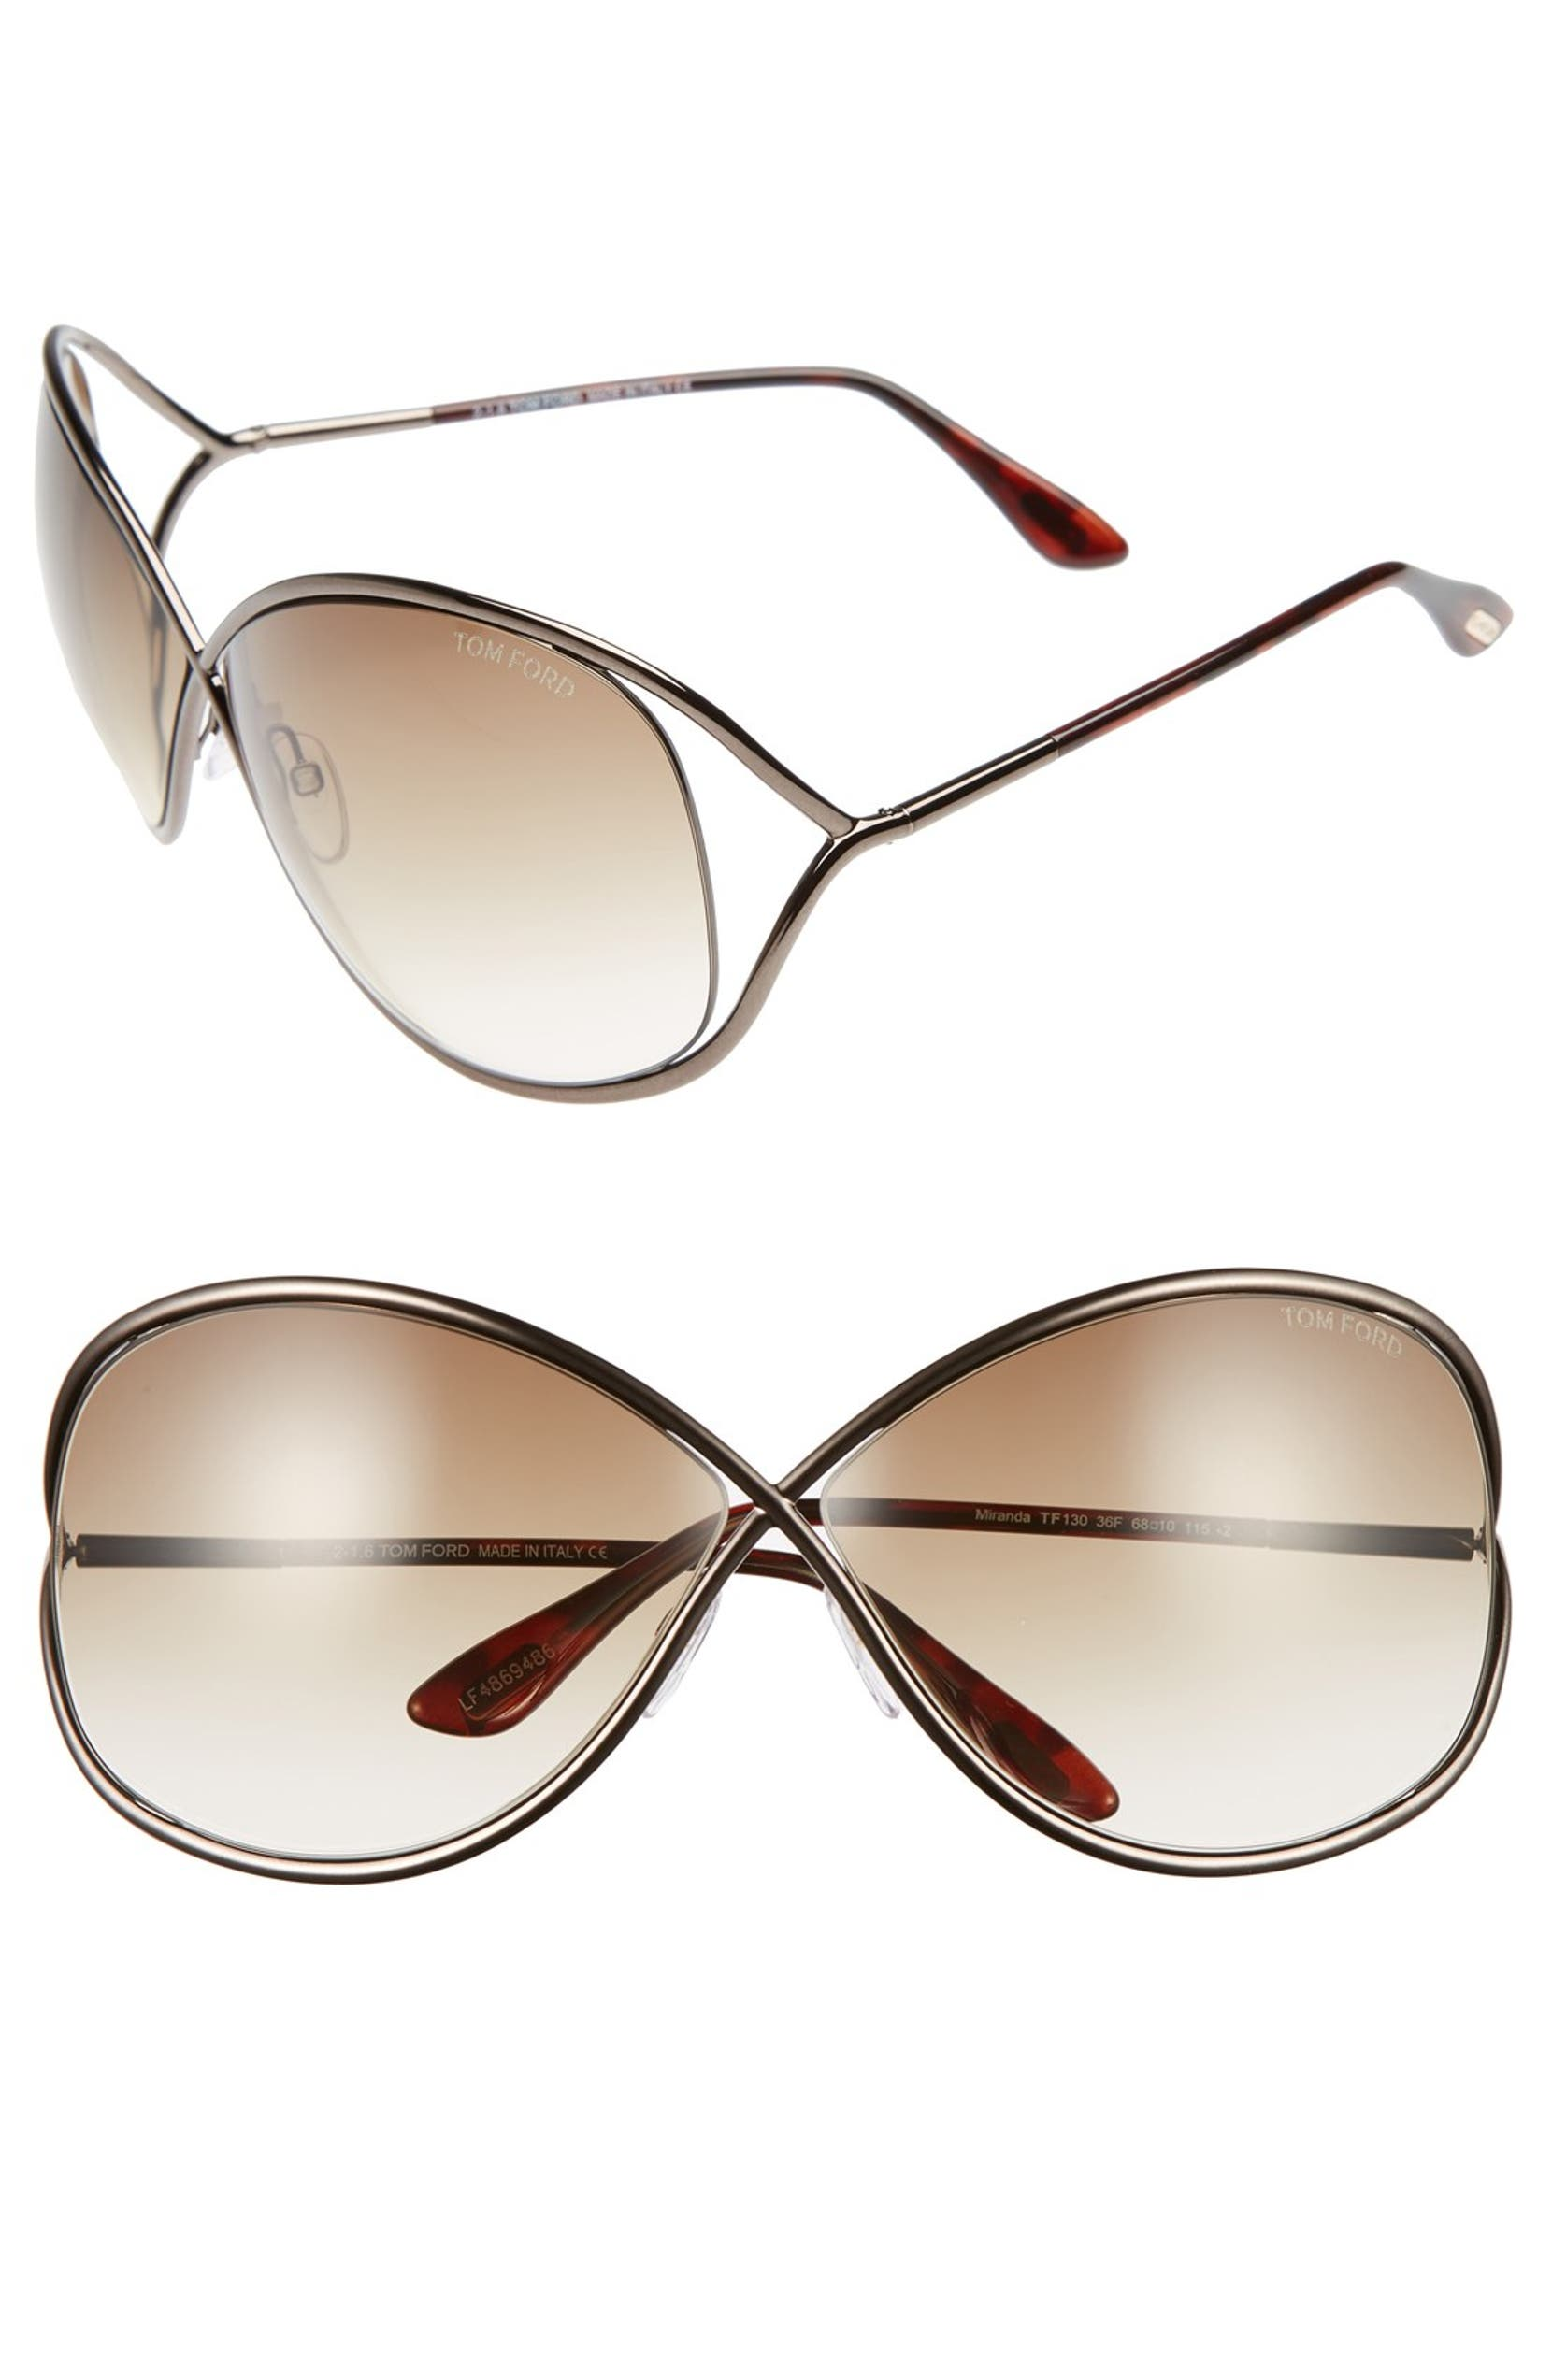 5bf12f05c7 Tom Ford Miranda 68mm Open Temple Oversize Metal Sunglasses